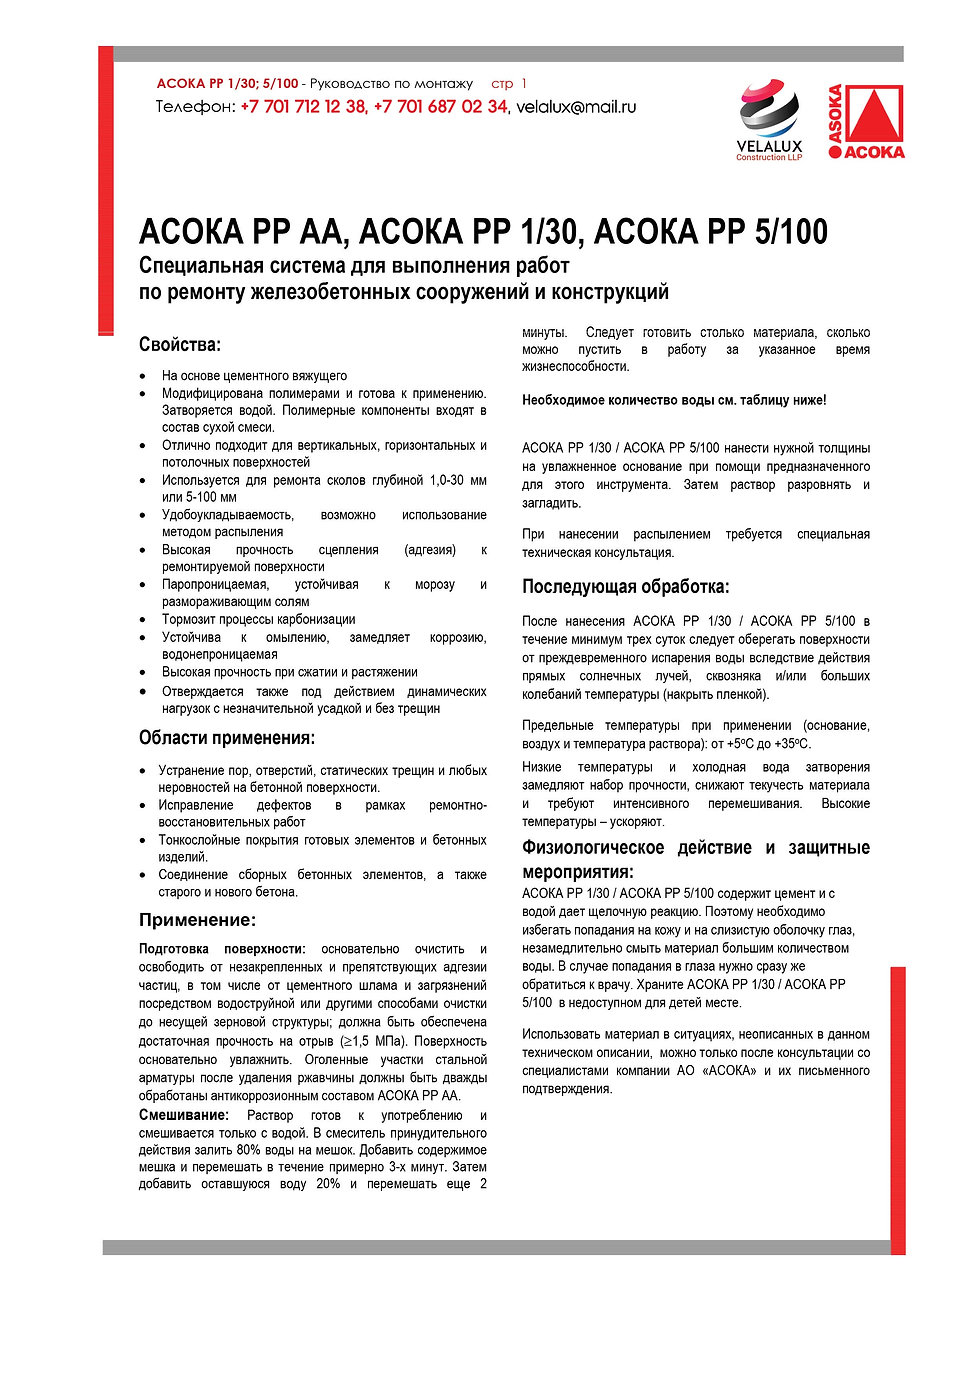 АСОКА PP 1 30_5 100.jpg